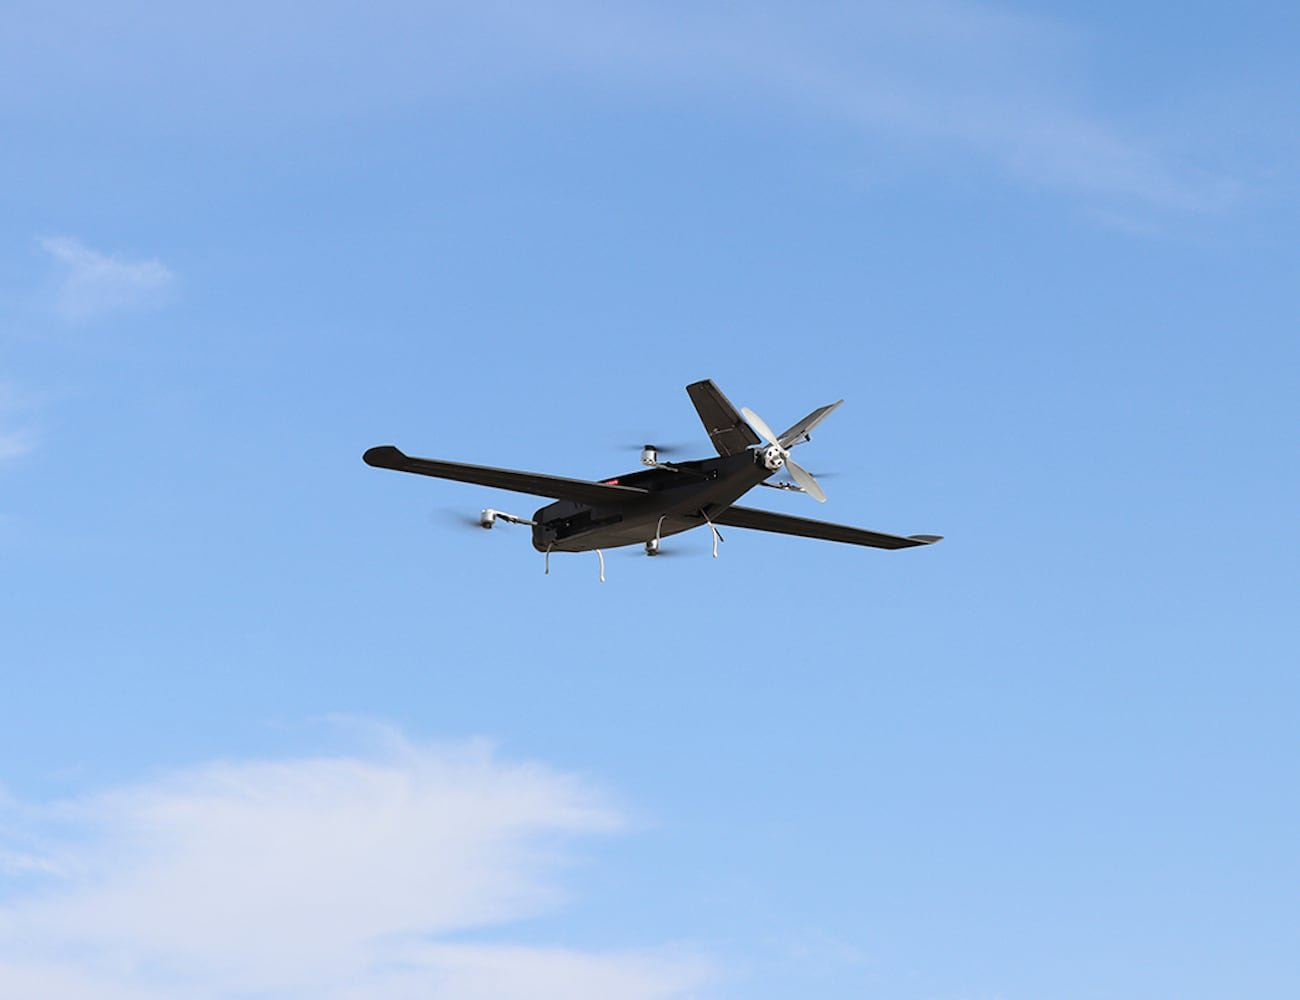 Krossblade SkyProwler 2 VTOL Transformer UAV does more than a regular drone